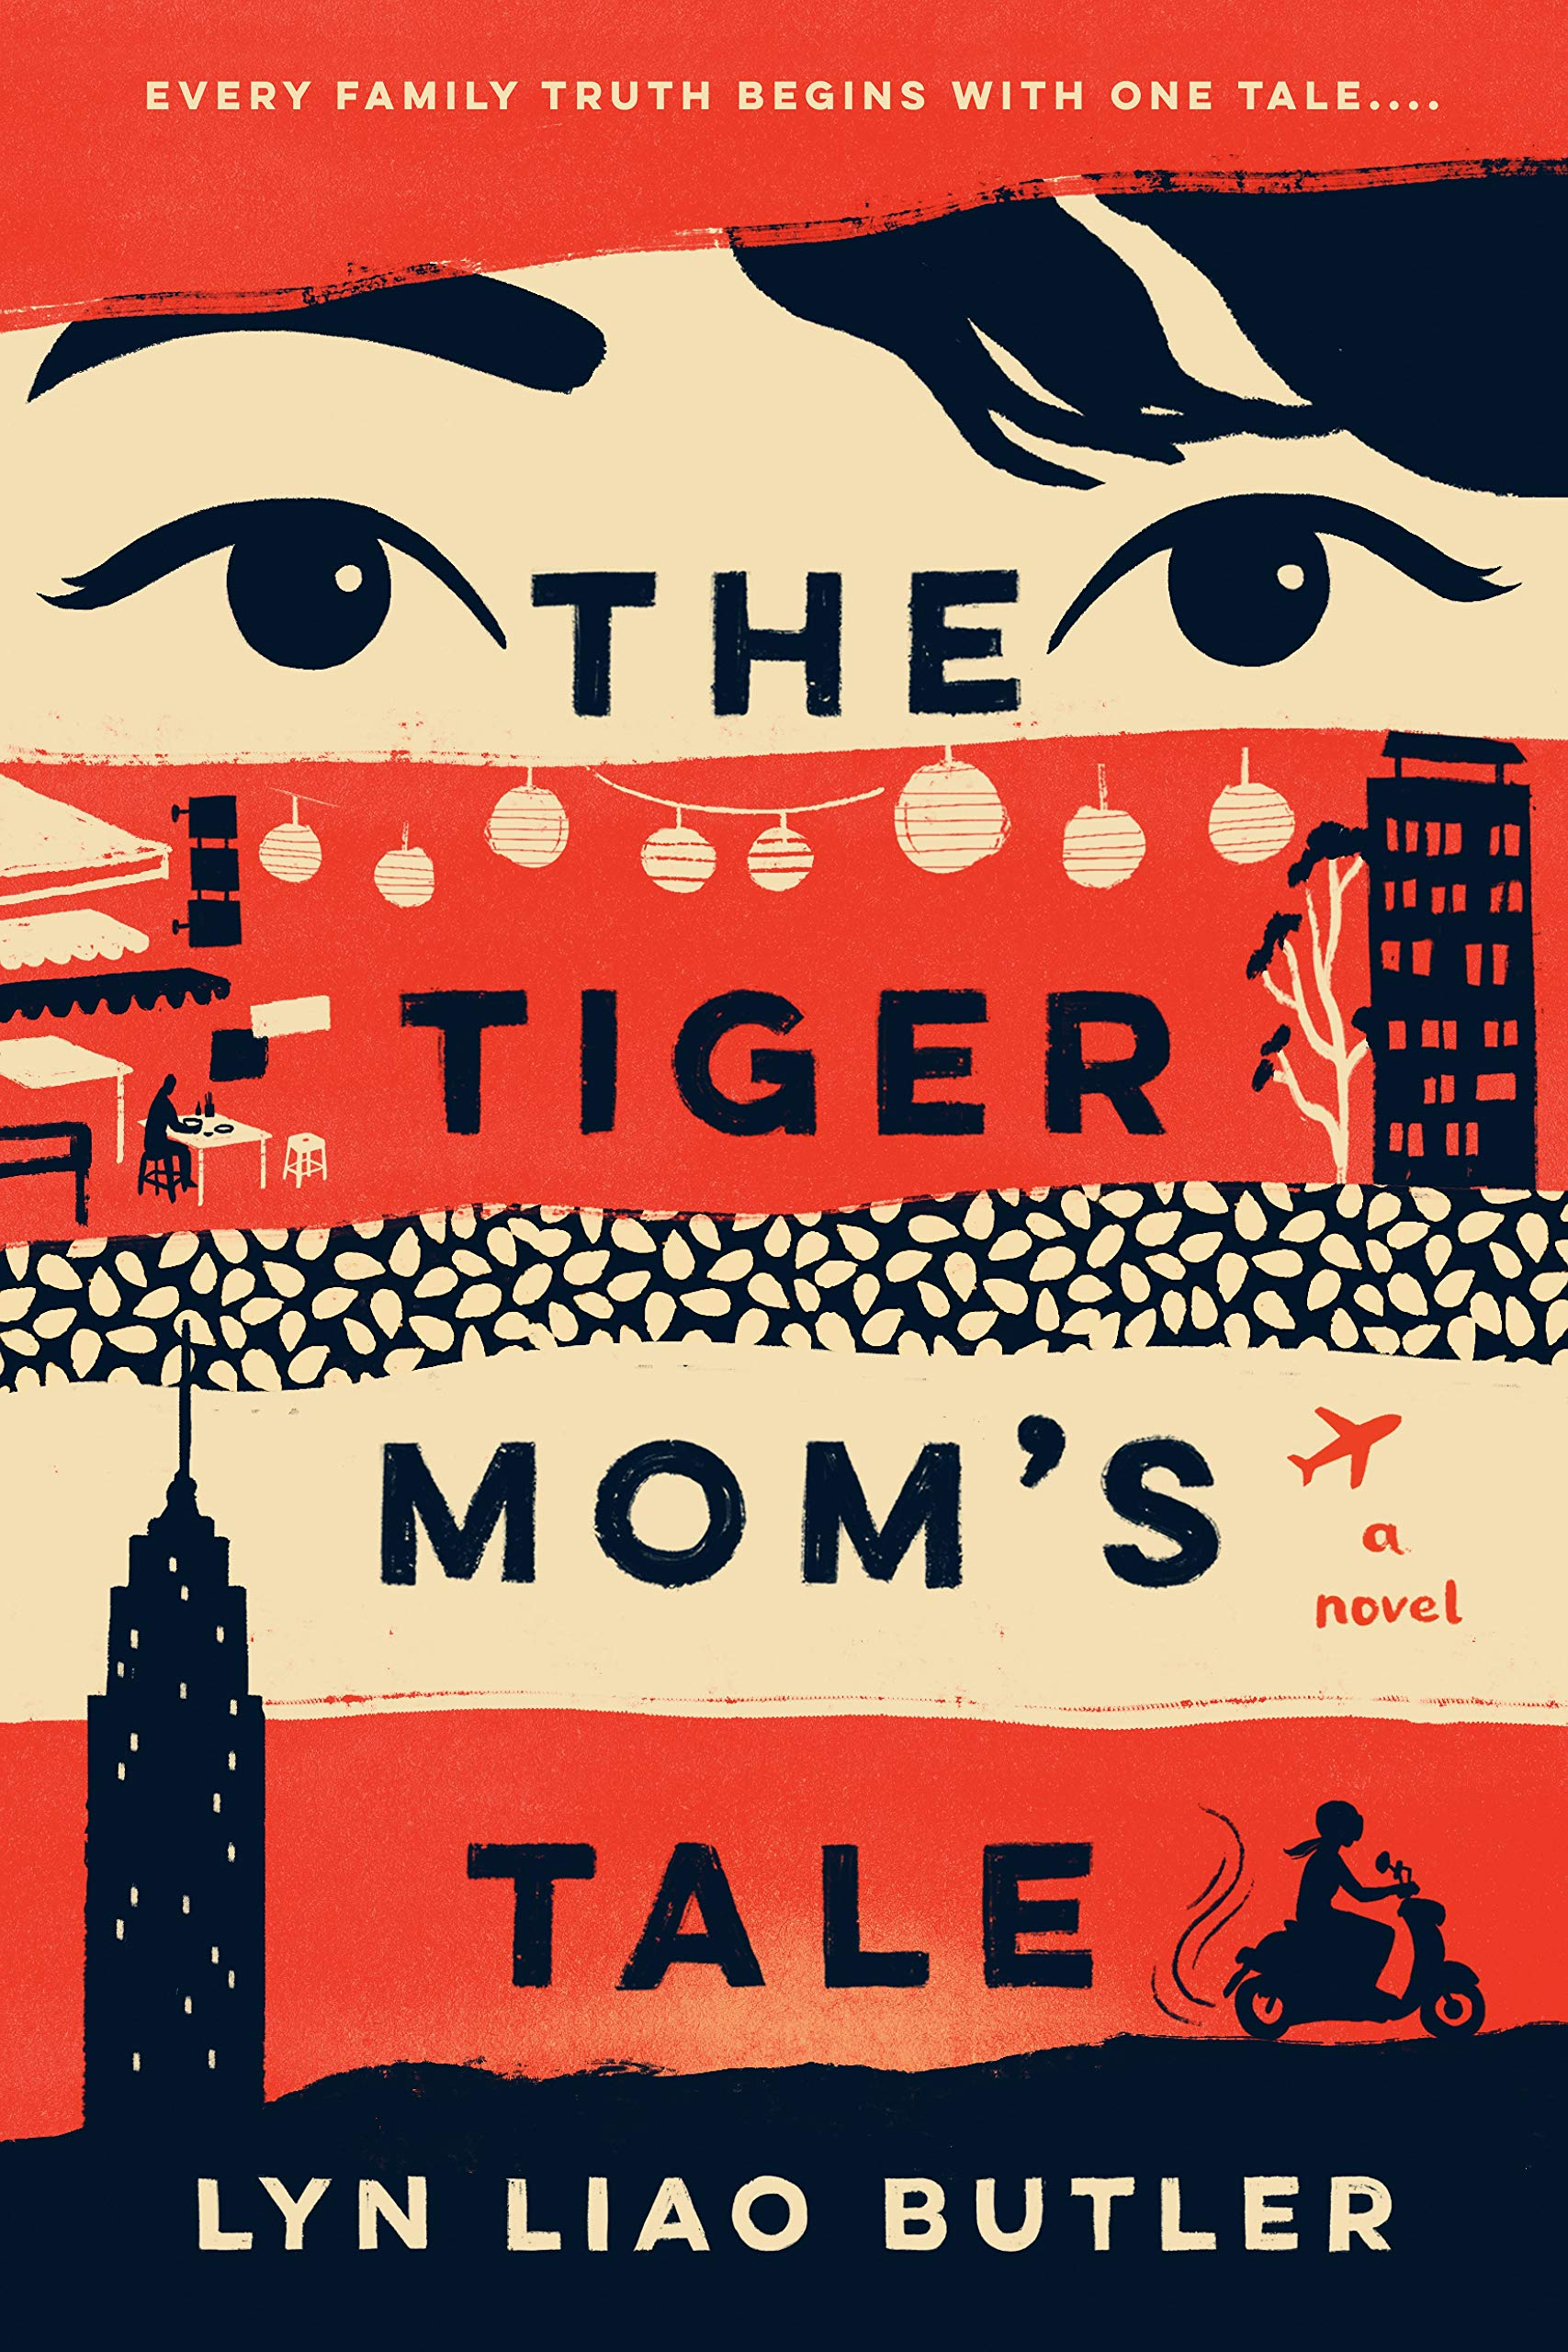 The Tiger Mom's Tale: Butler, Lyn Liao: 9780593198728: Amazon.com: Books